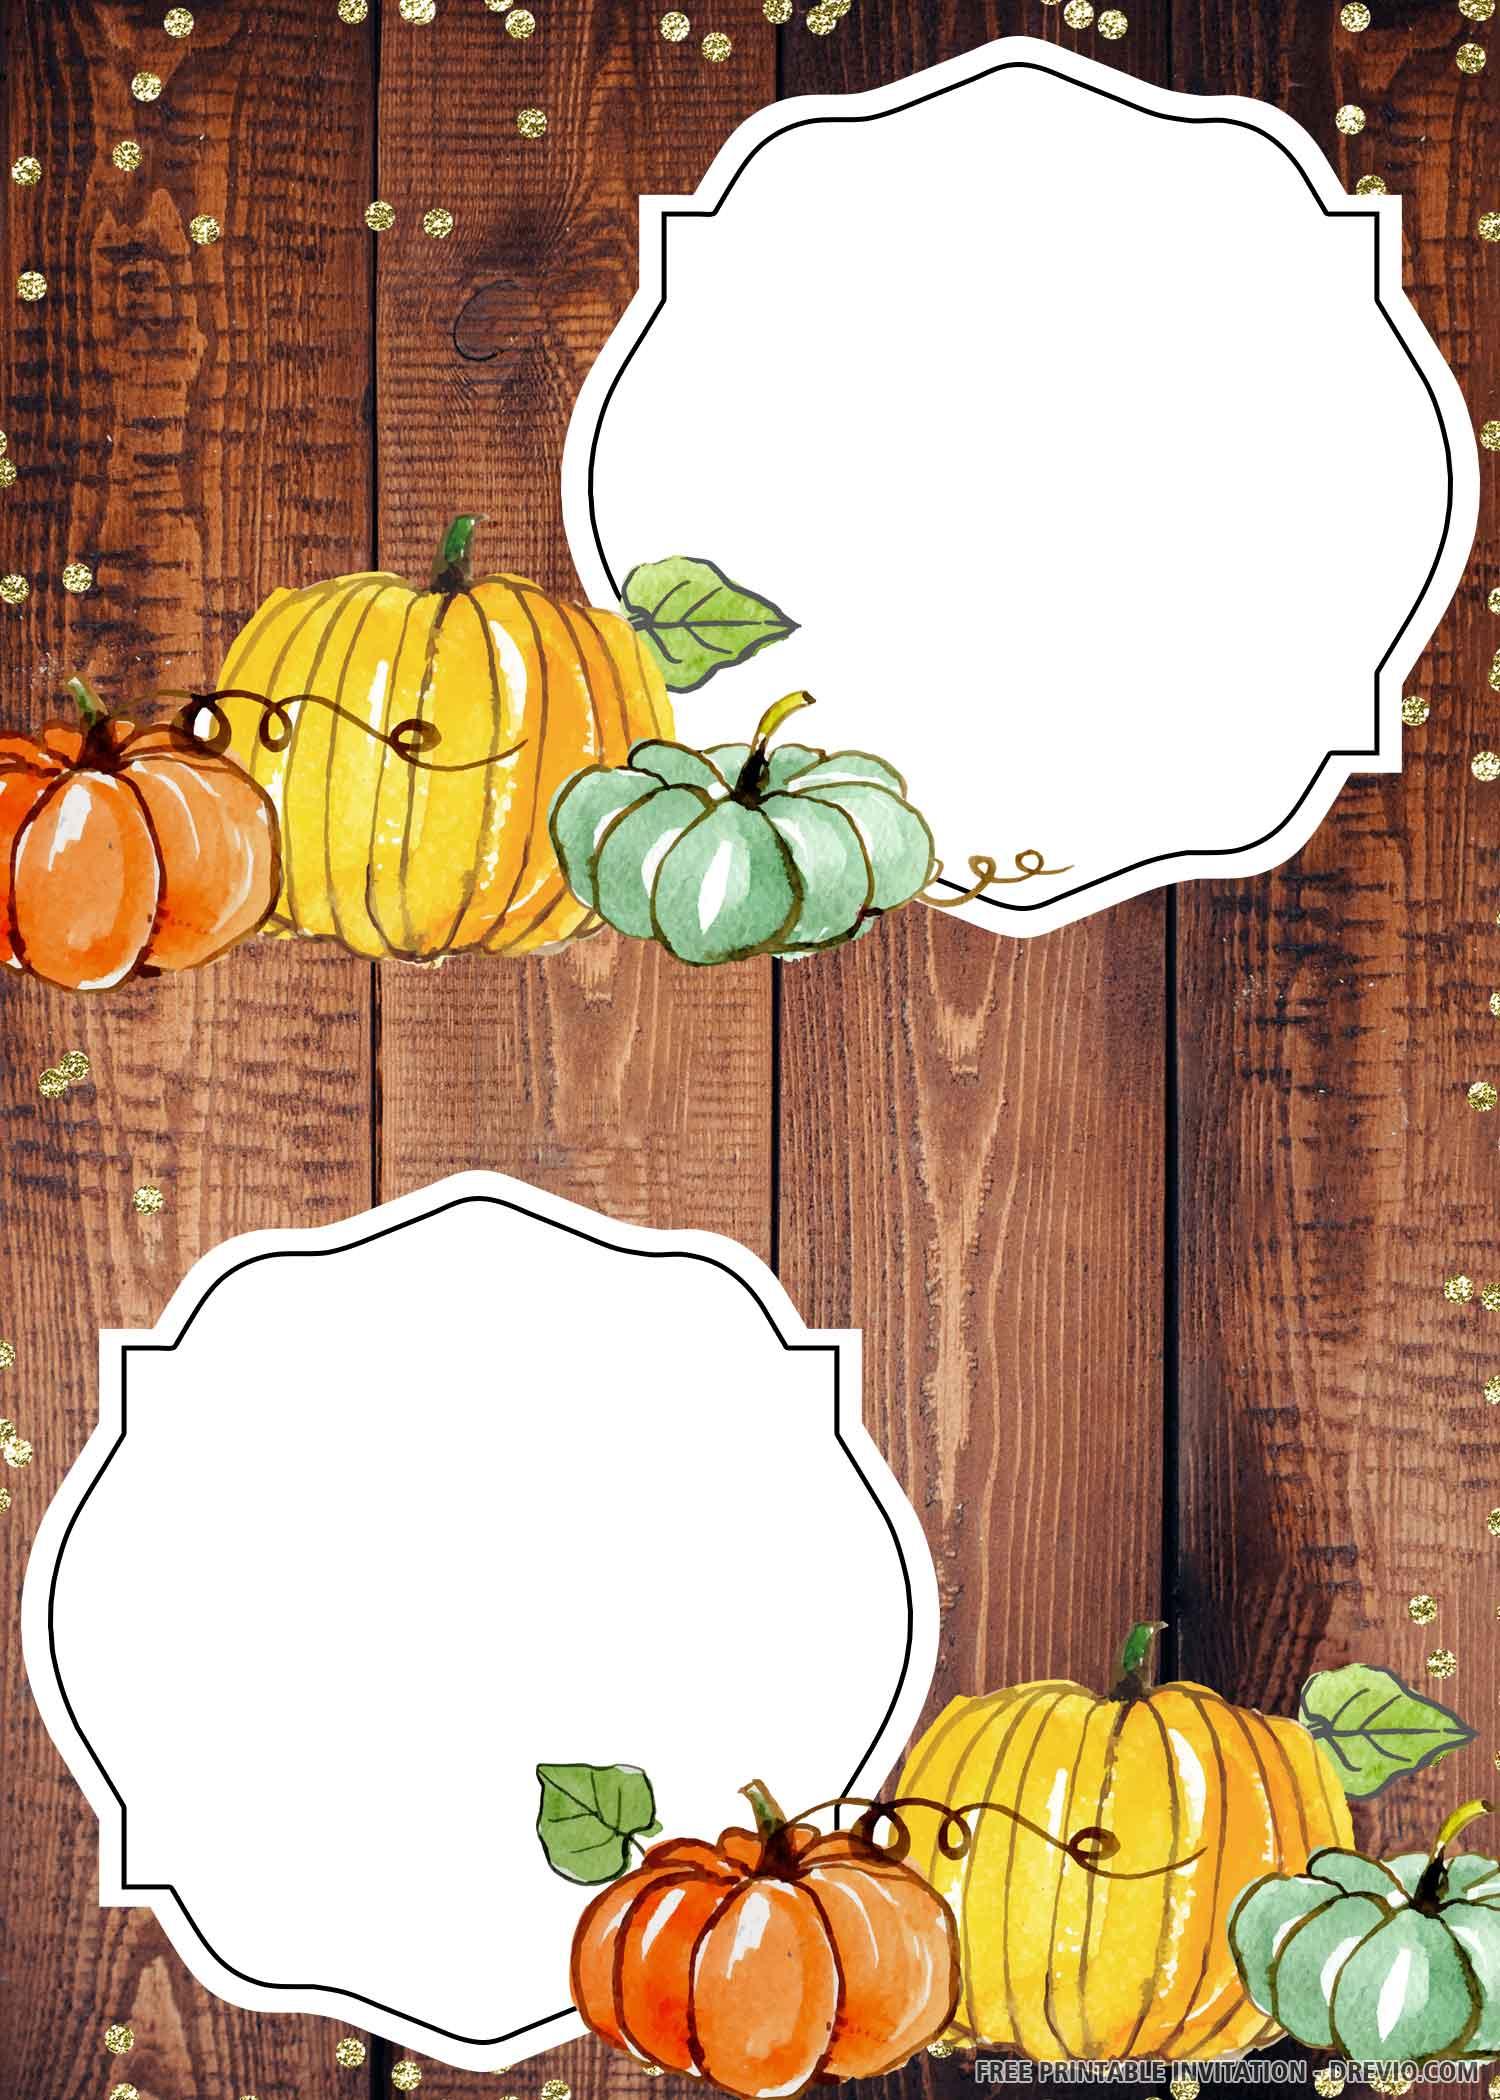 Free Printable Pumpkin Fall Harvest Birthday